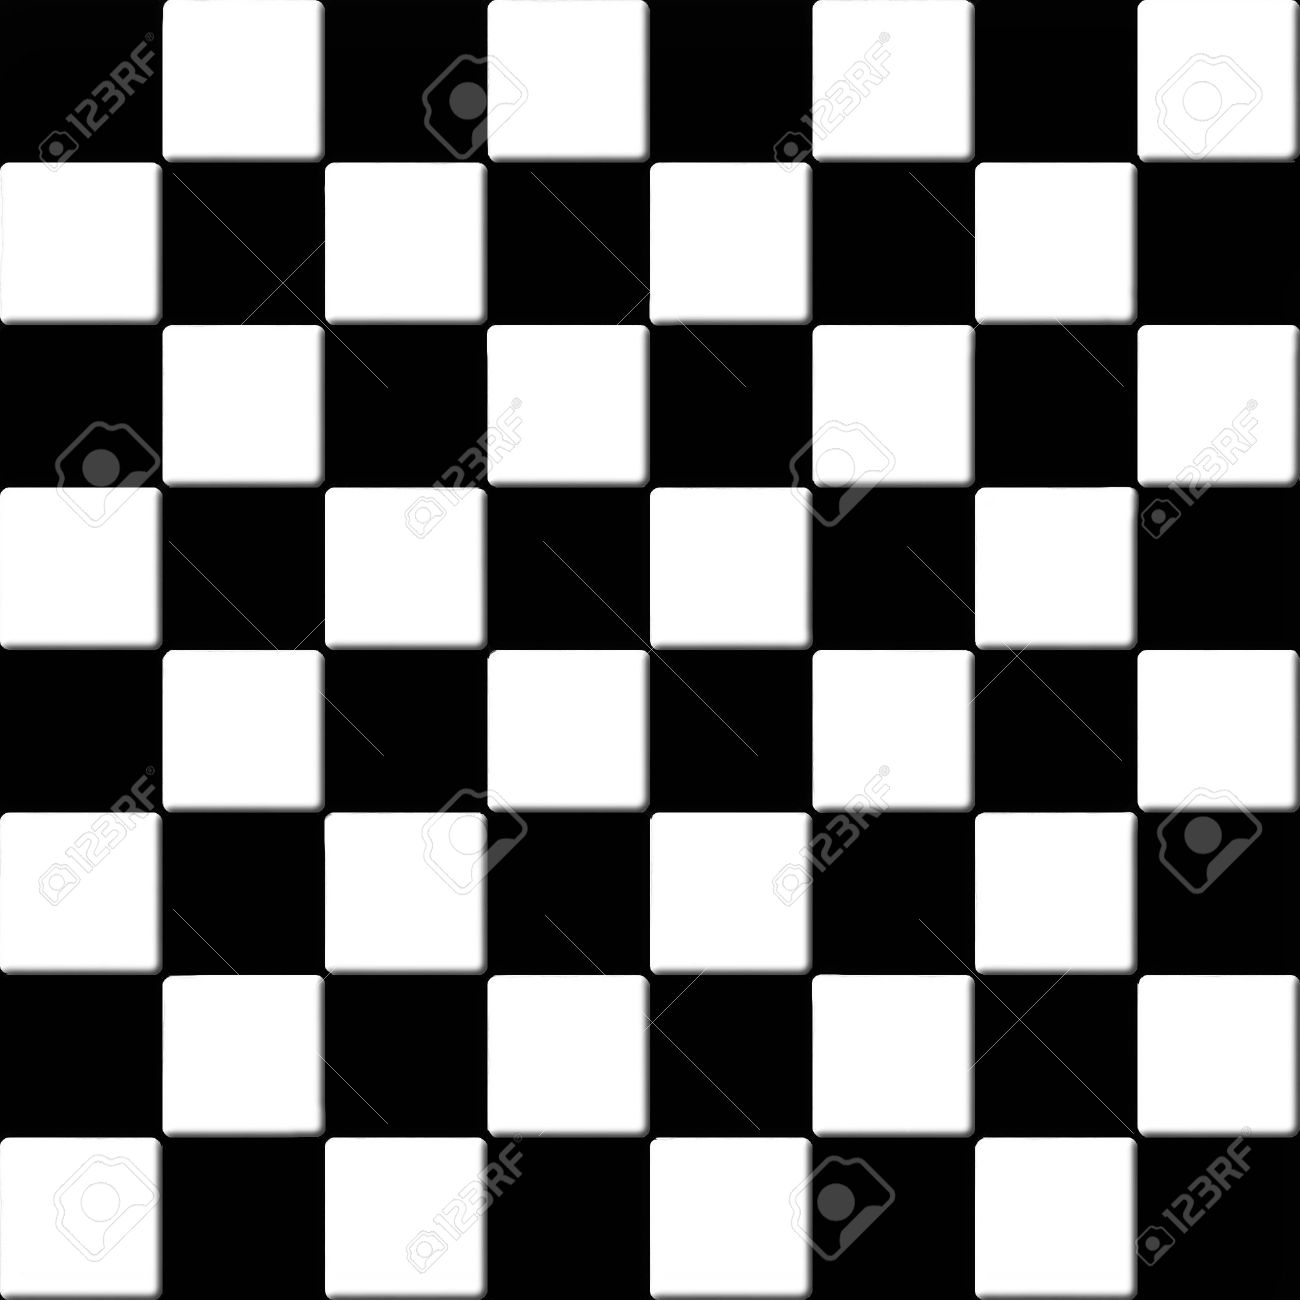 . Black And White Floor